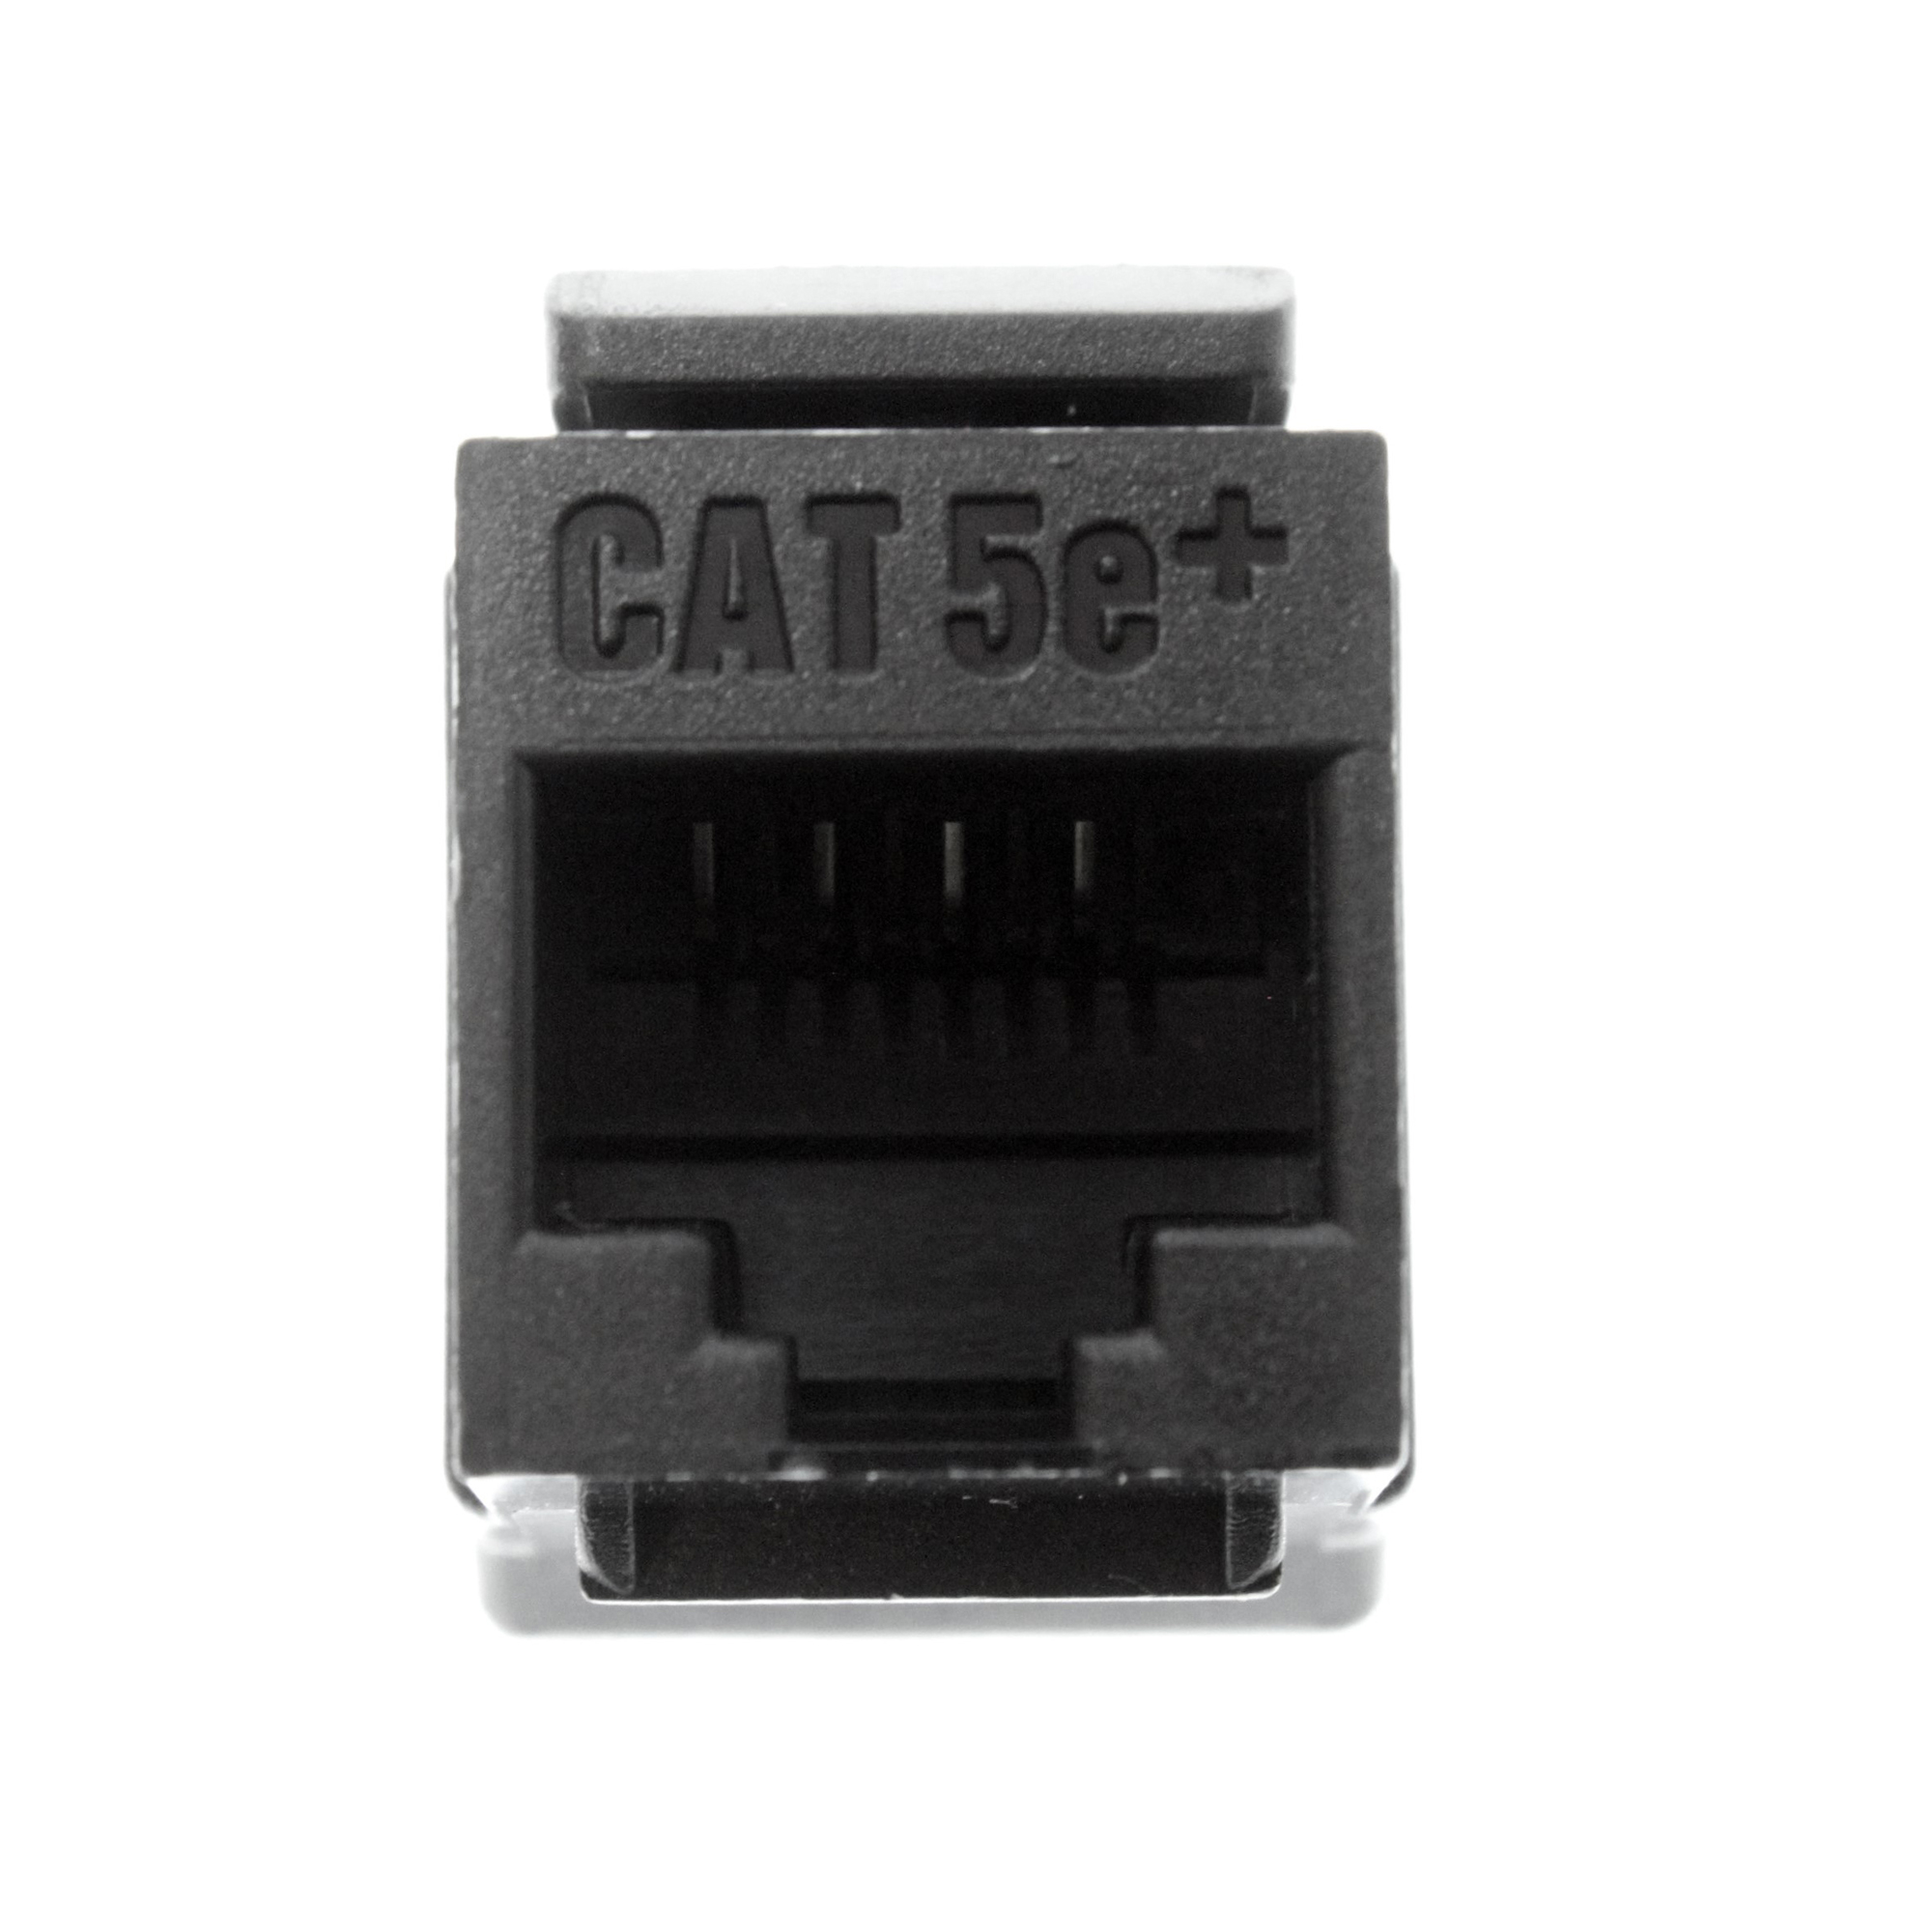 hight resolution of on q legrand wp3450 bk quick connect cat5e category 5e rj45 keystone wiring cat5e keystone jack